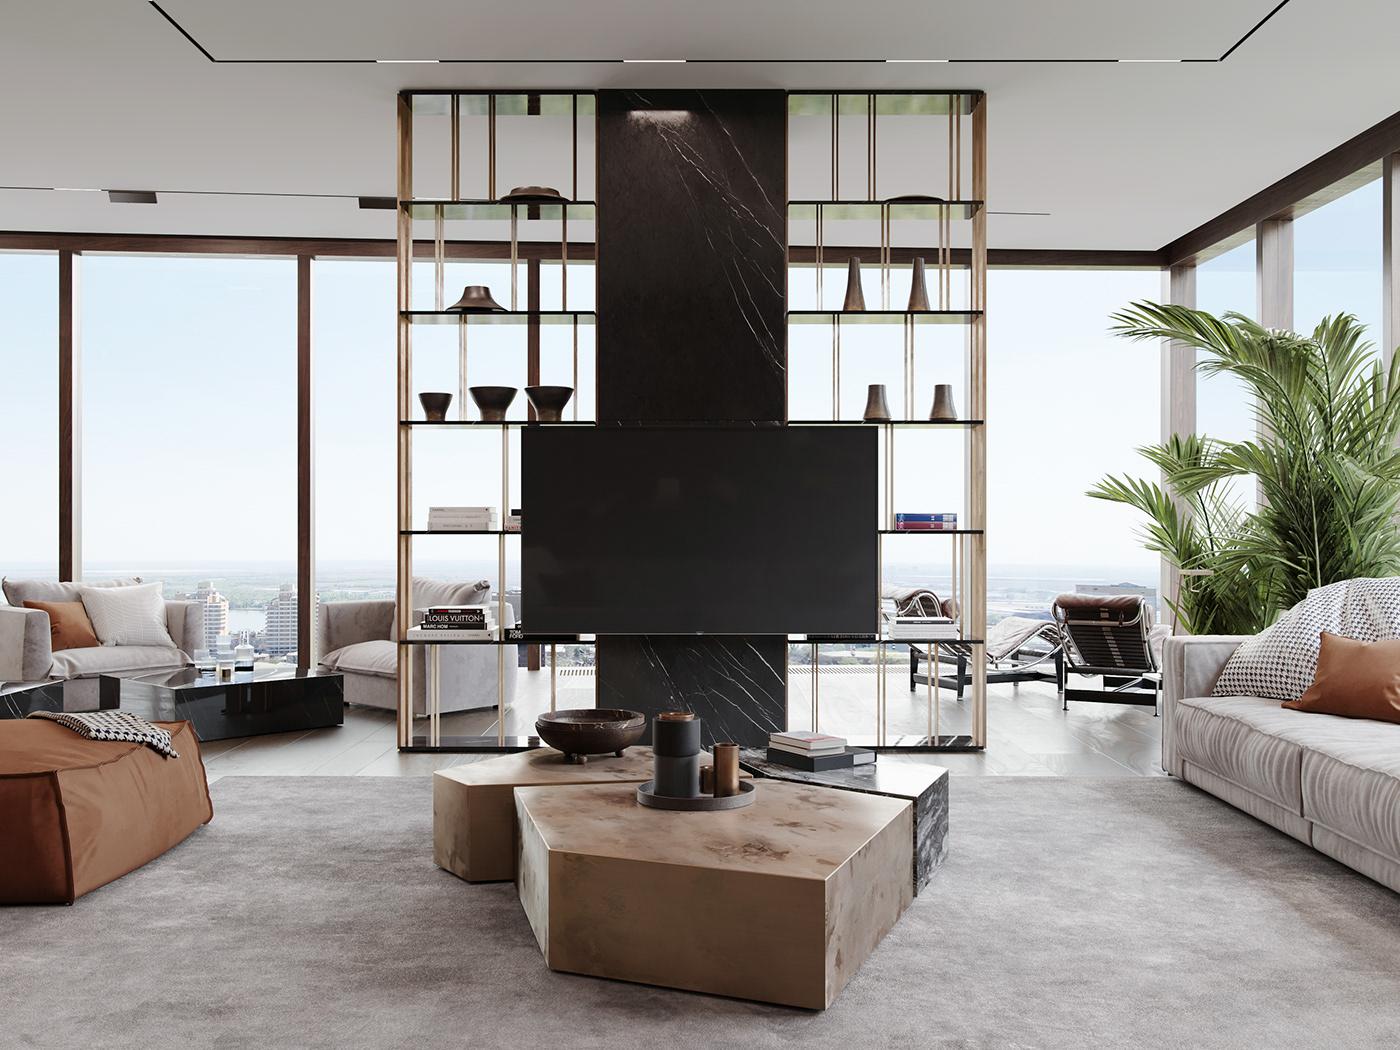 interior design  design Modern Design Interior Minimalism architecture